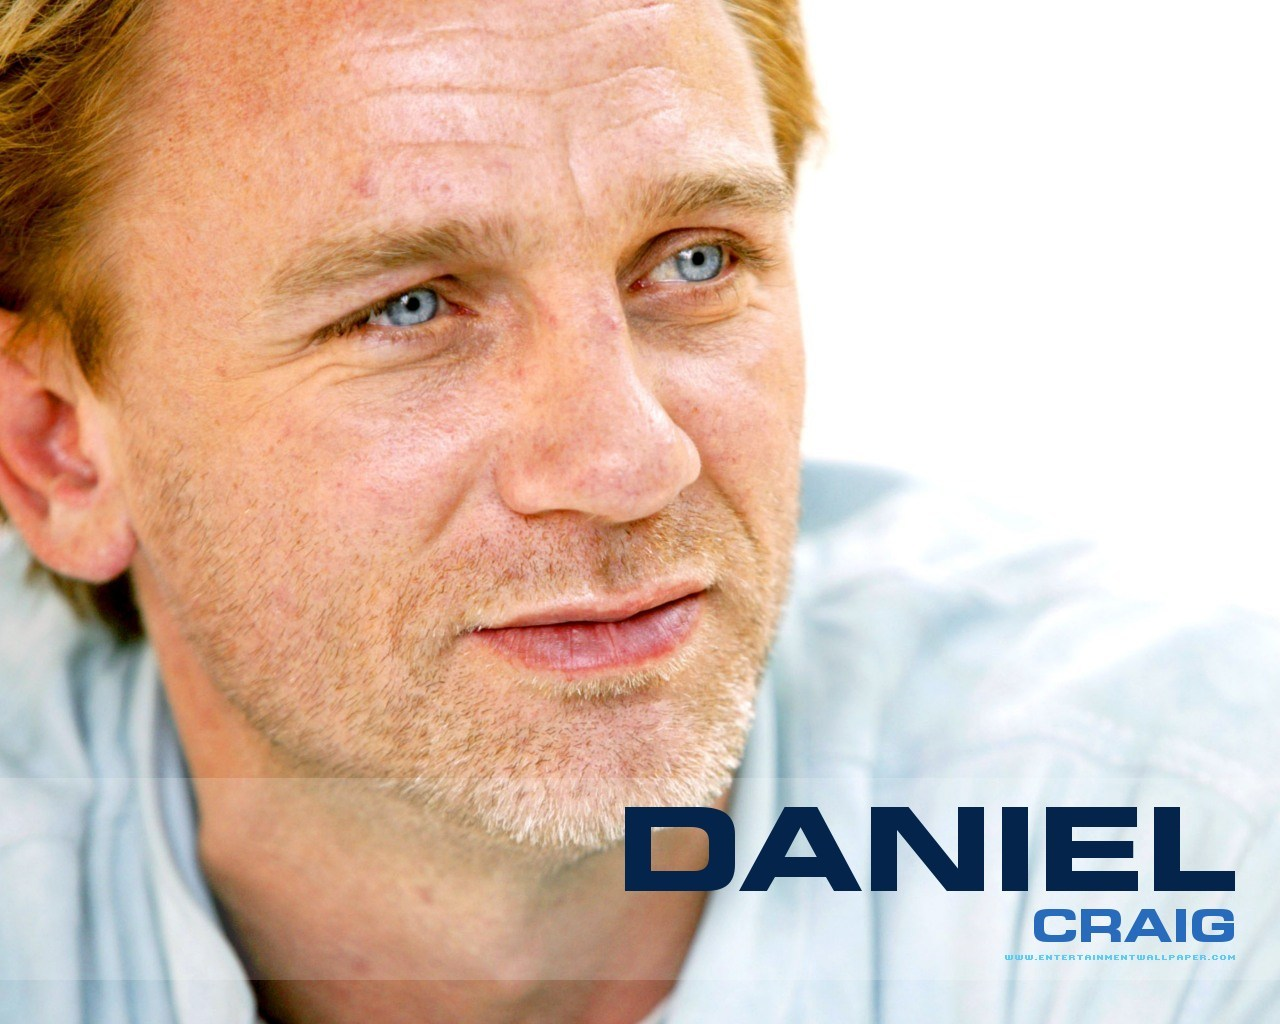 Daniel Craig Daniel Craig Daniel Craig